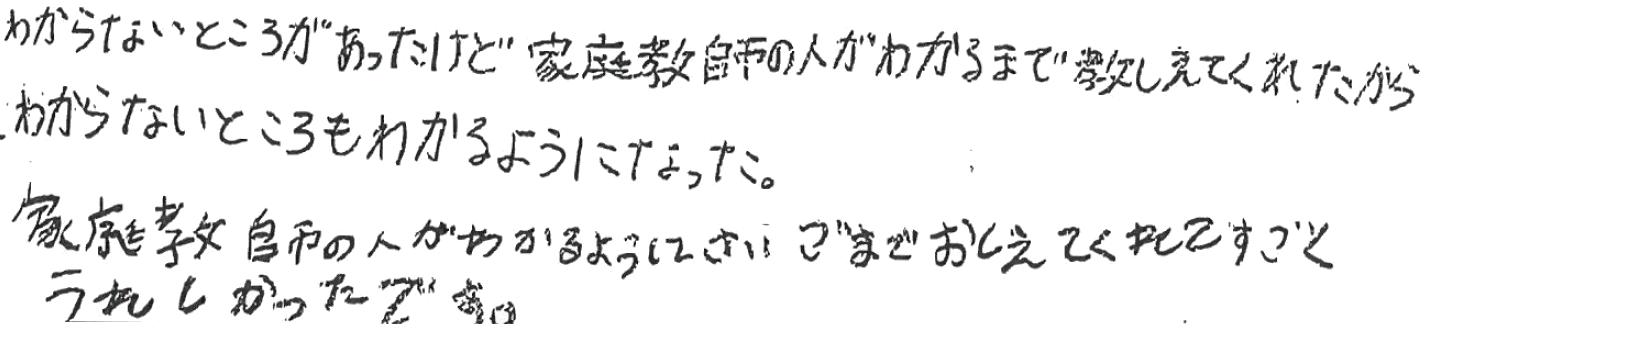 Aちゃん・K君(和泉市)からの口コミ